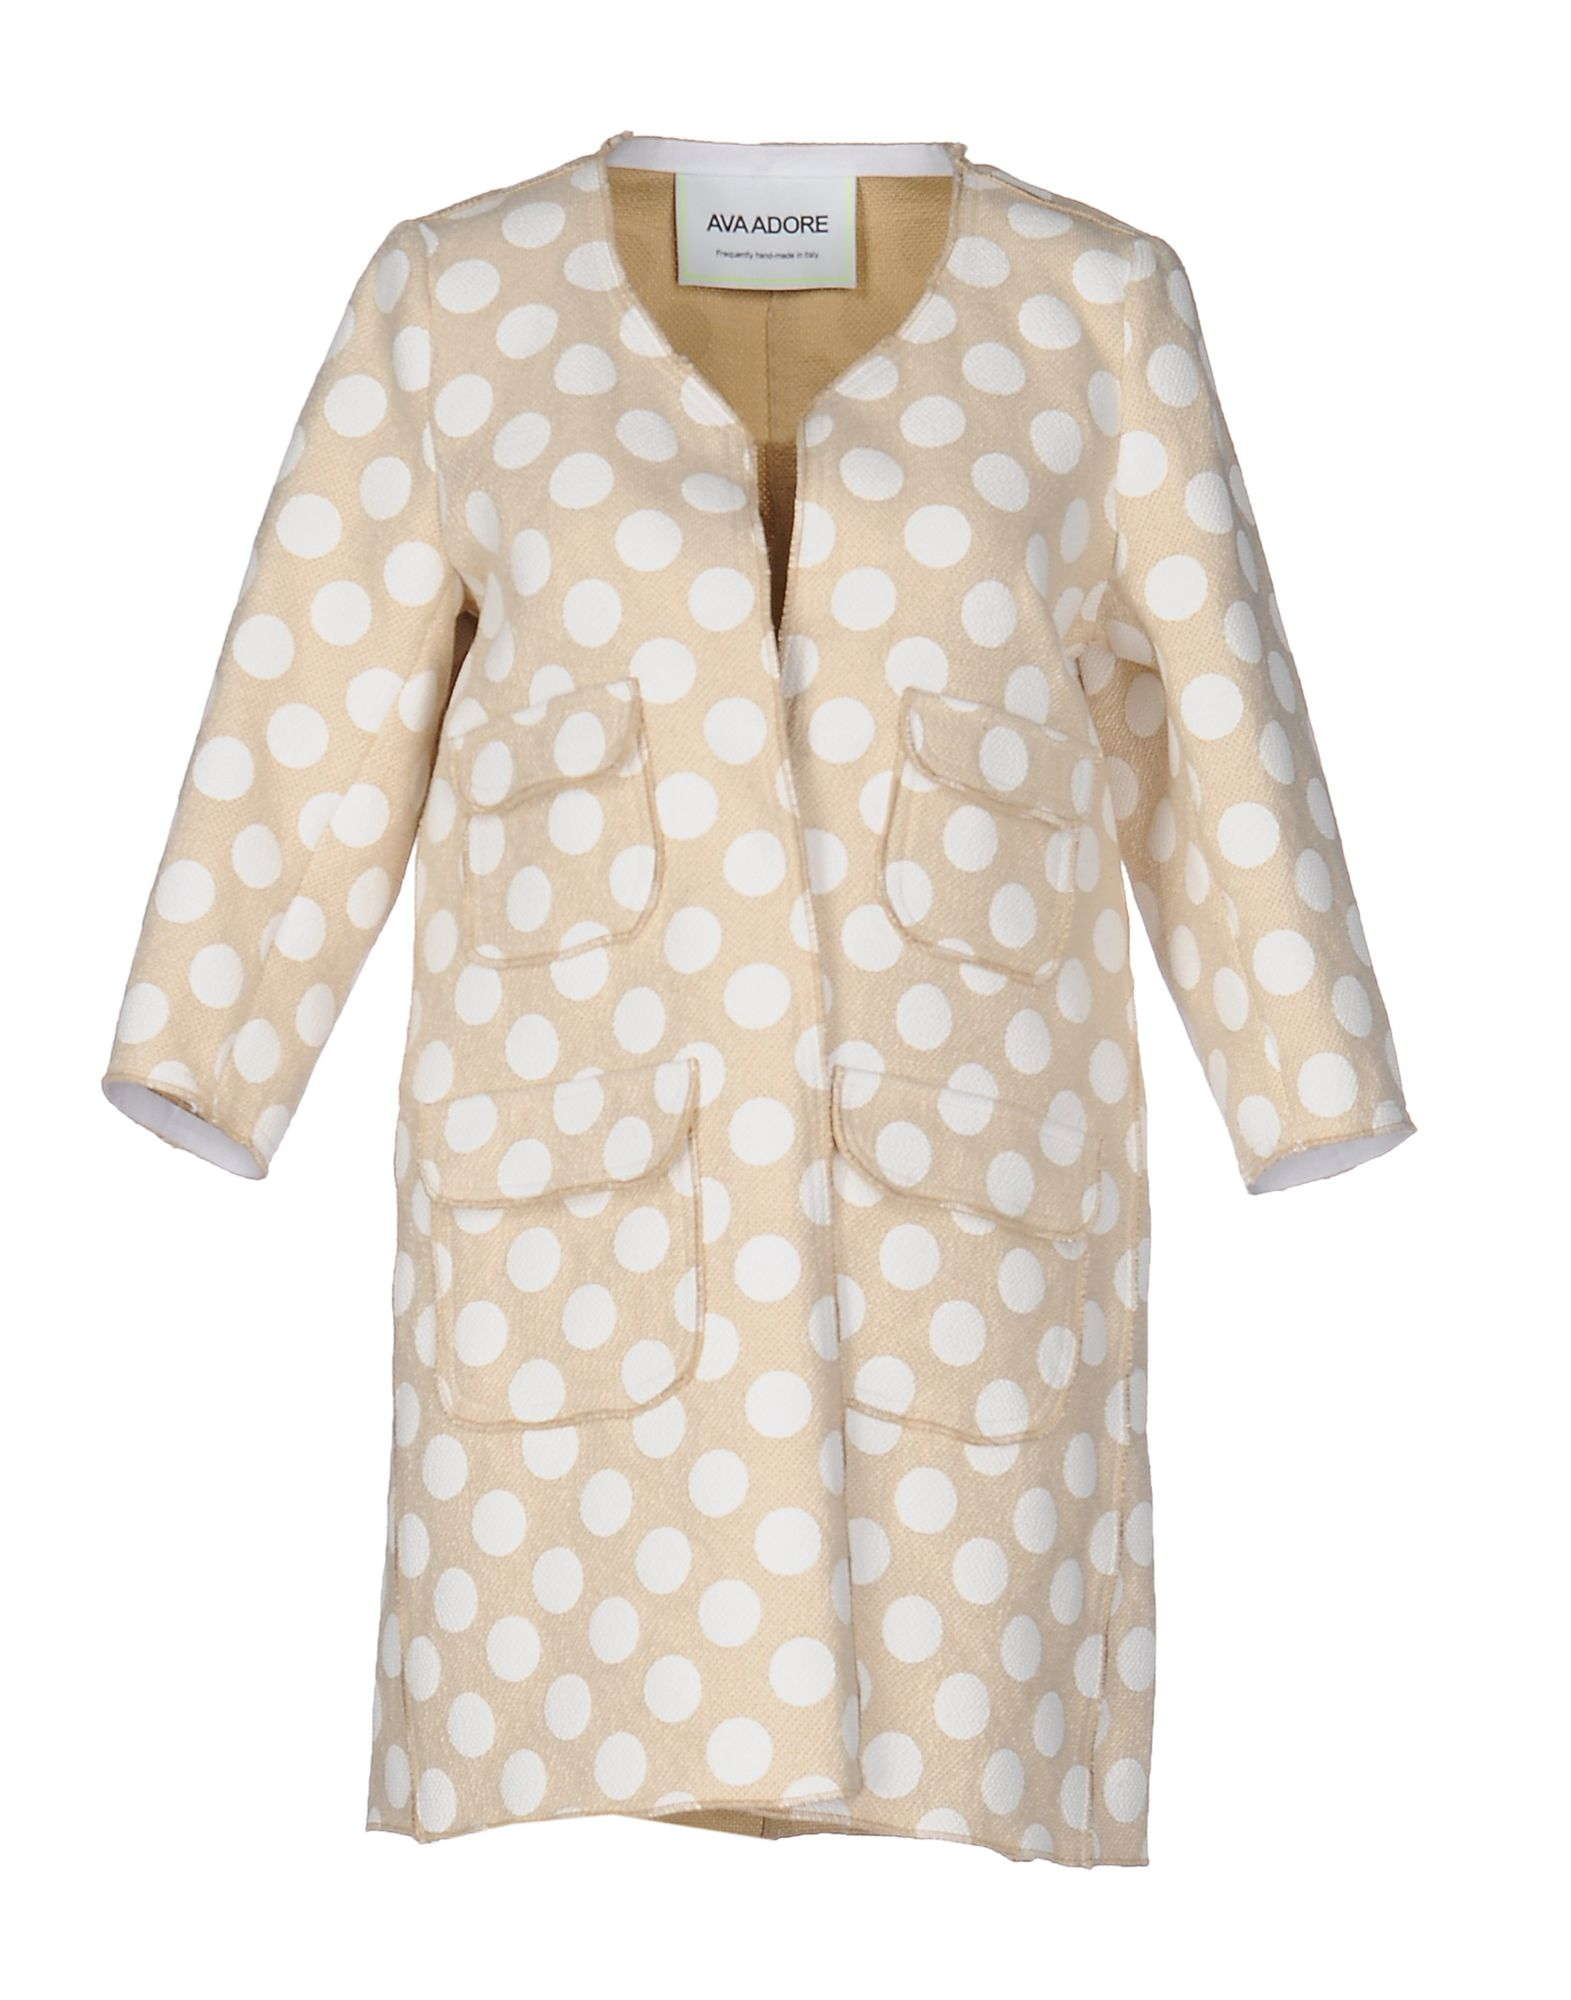 AVA ADORE Легкое пальто одежда для сна adore imf420